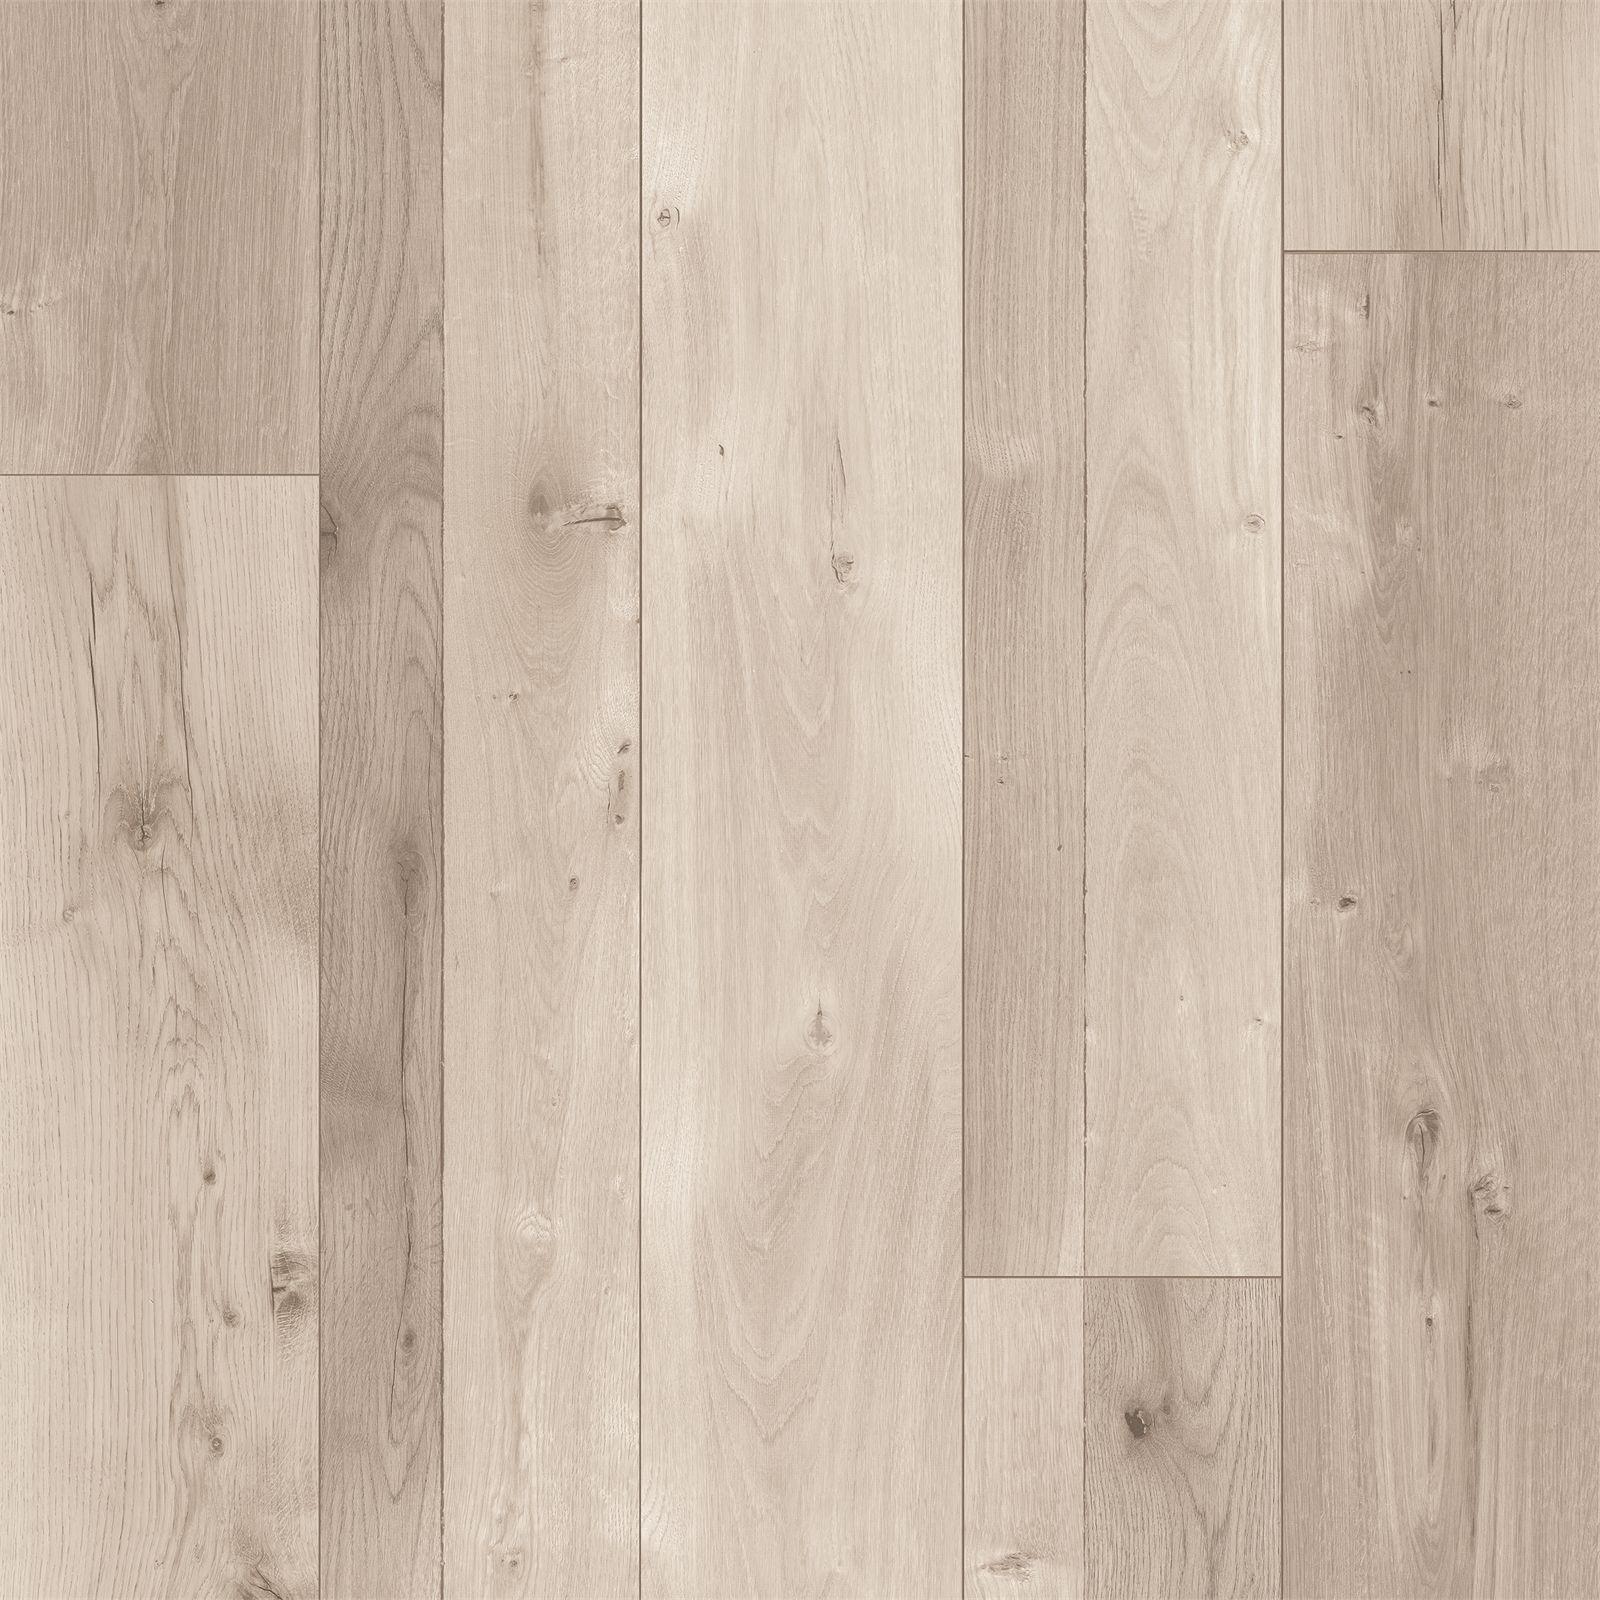 Formica 10mm 10.10sqm Urban Styled Oak Laminate Flooring  Bunnings